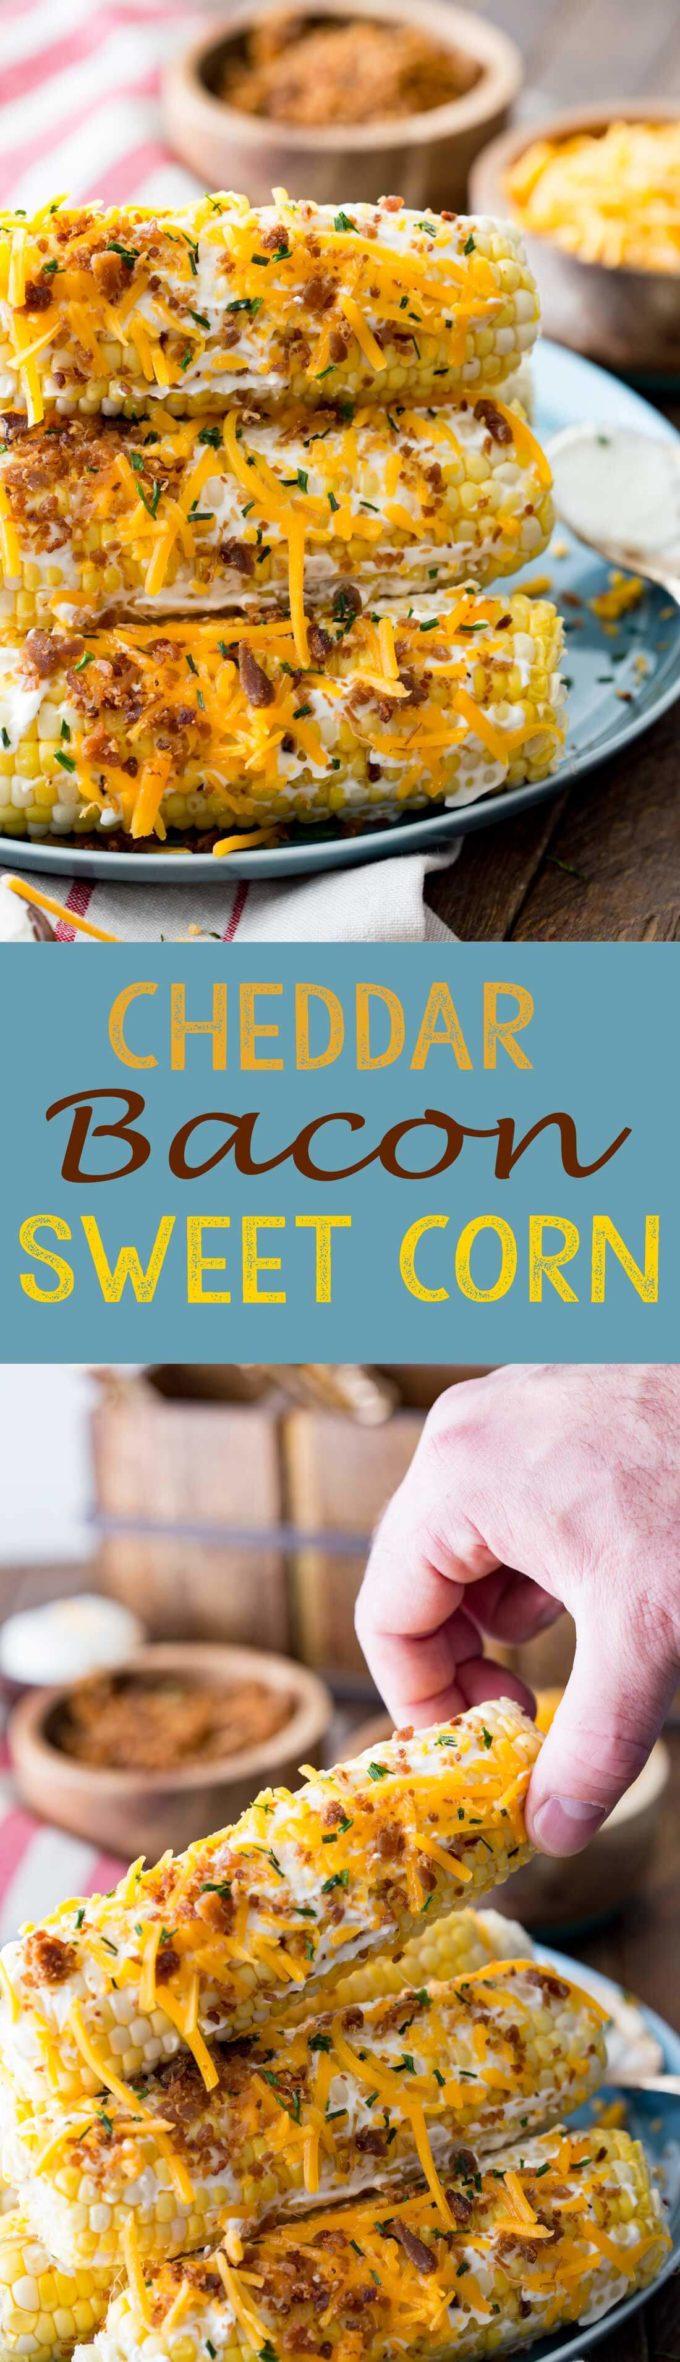 Cheddar bacon sweet corn is a fantastic amazing dinner side dish.